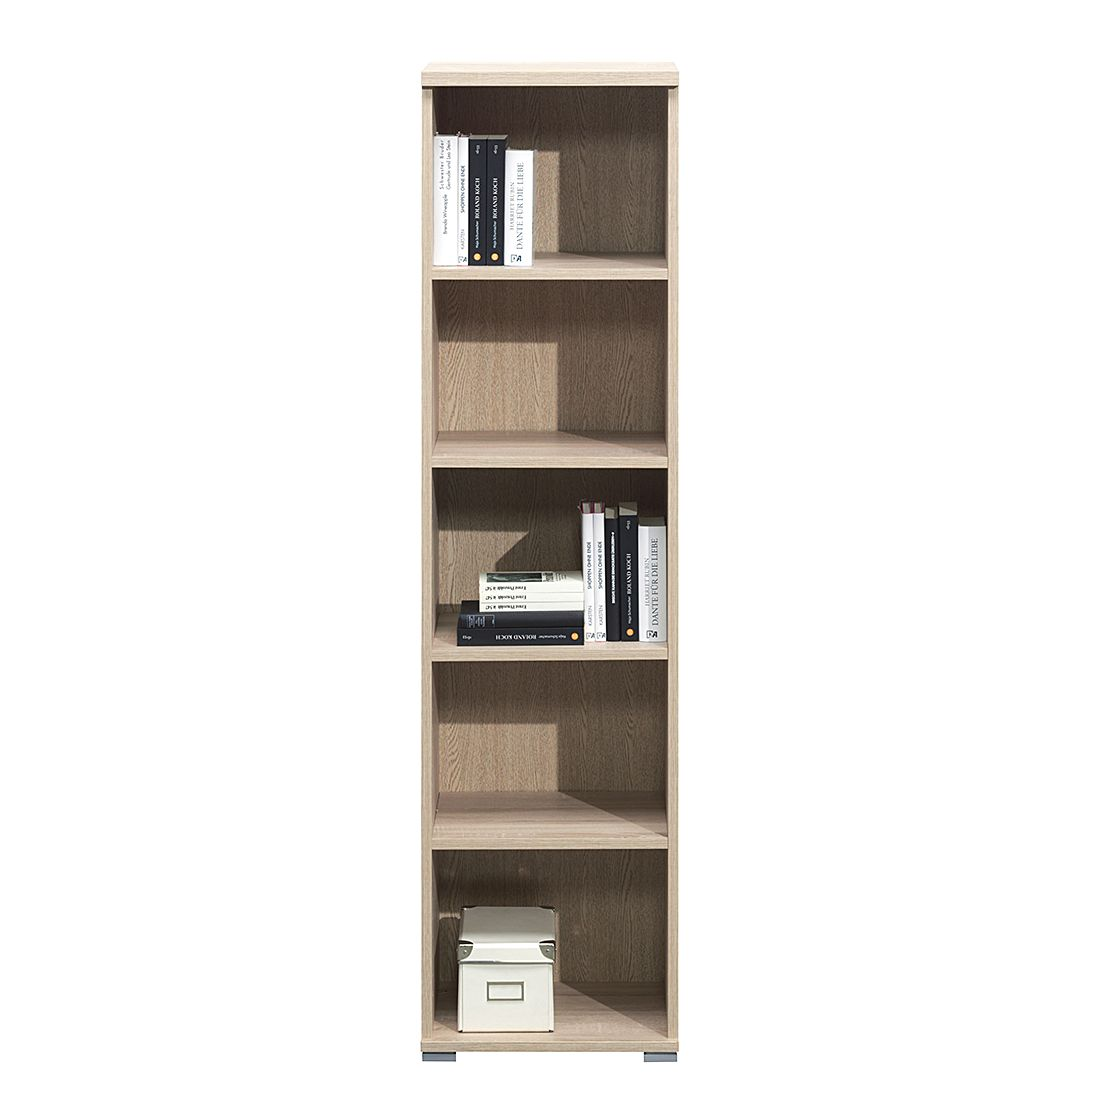 regal rio art i eiche dekor raumteiler b cherregal. Black Bedroom Furniture Sets. Home Design Ideas